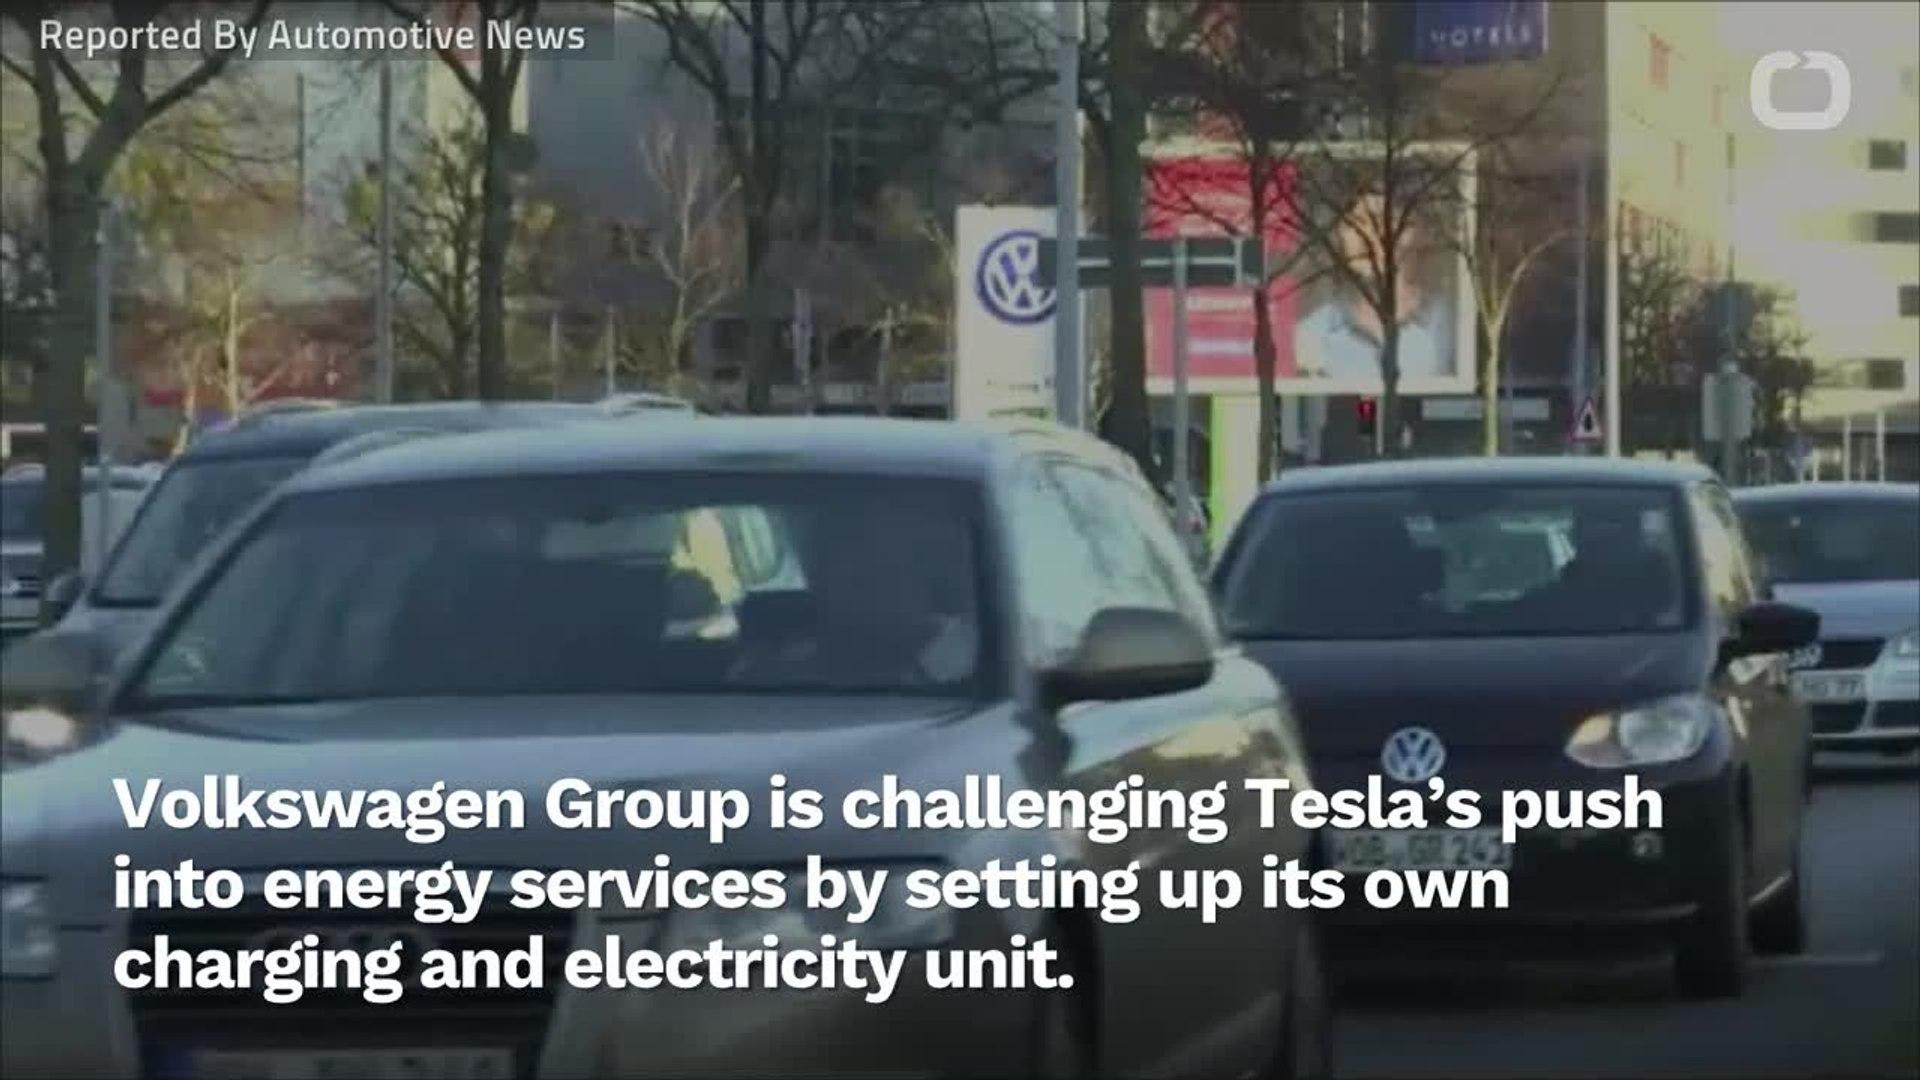 Volkswagen Challenges Tesla With EV Charging, Electricity Unit